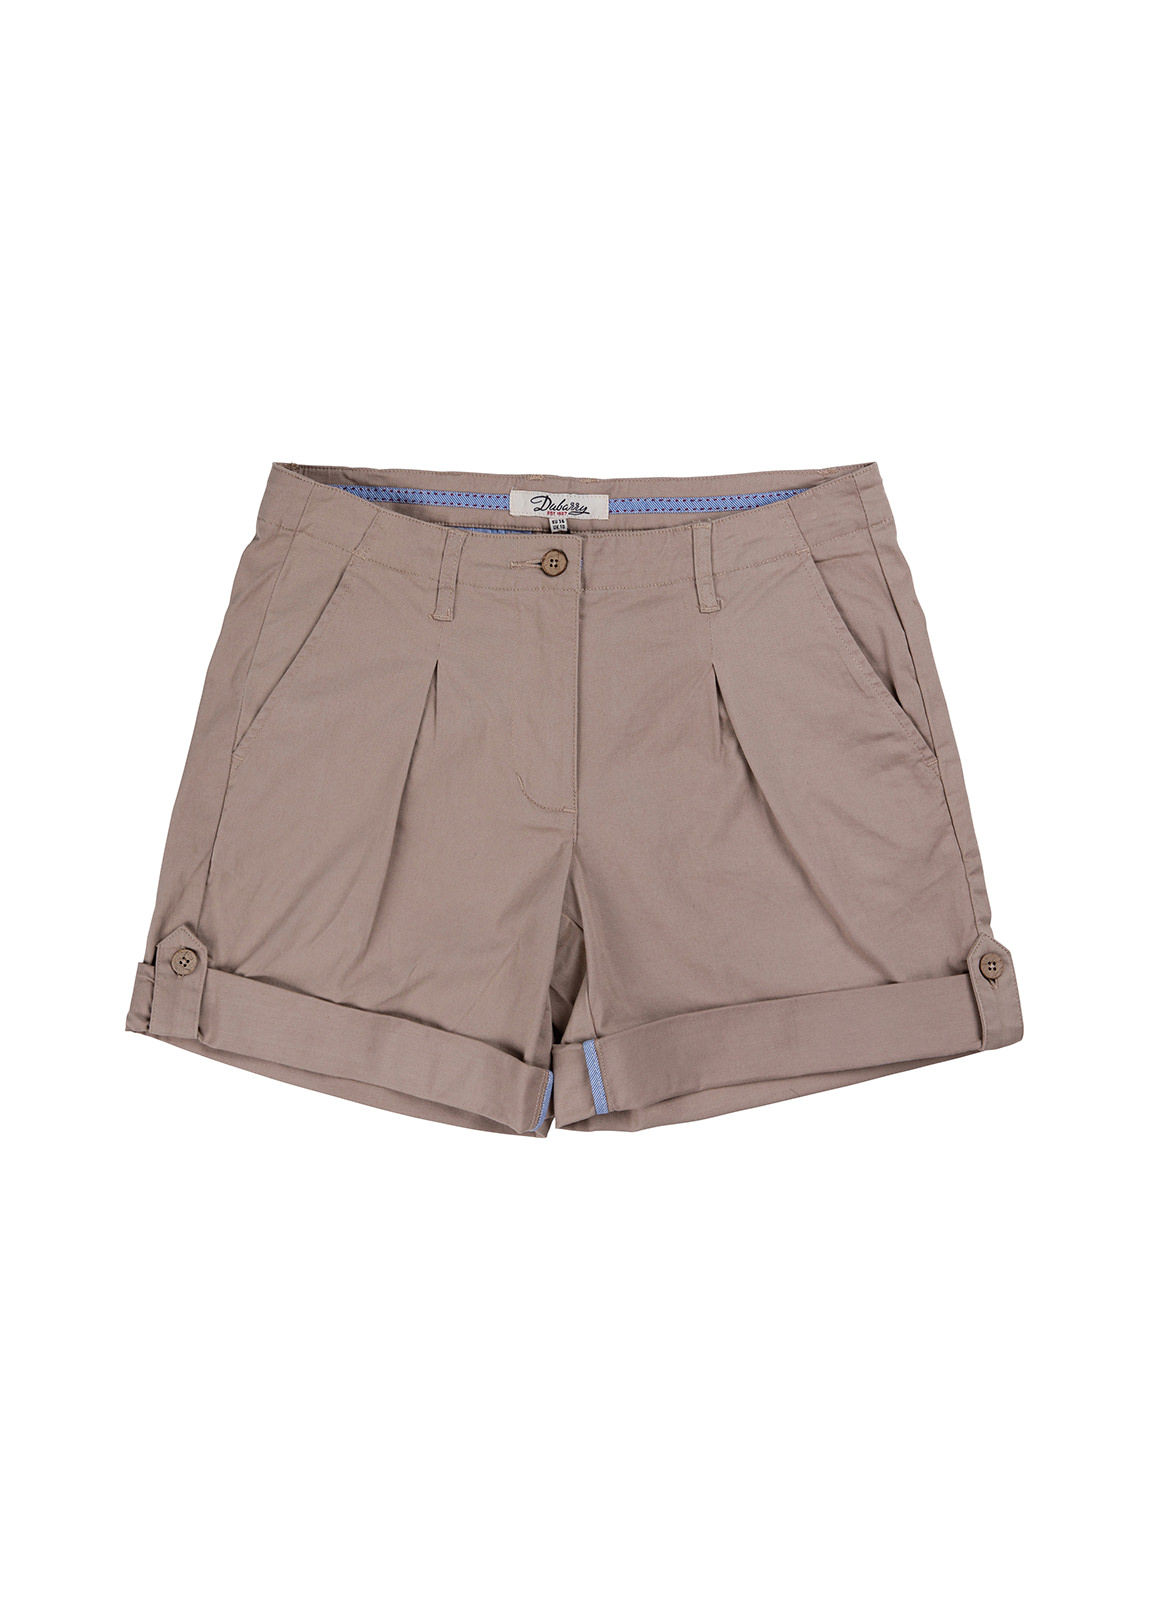 Summerhill ladies shorts - Sand